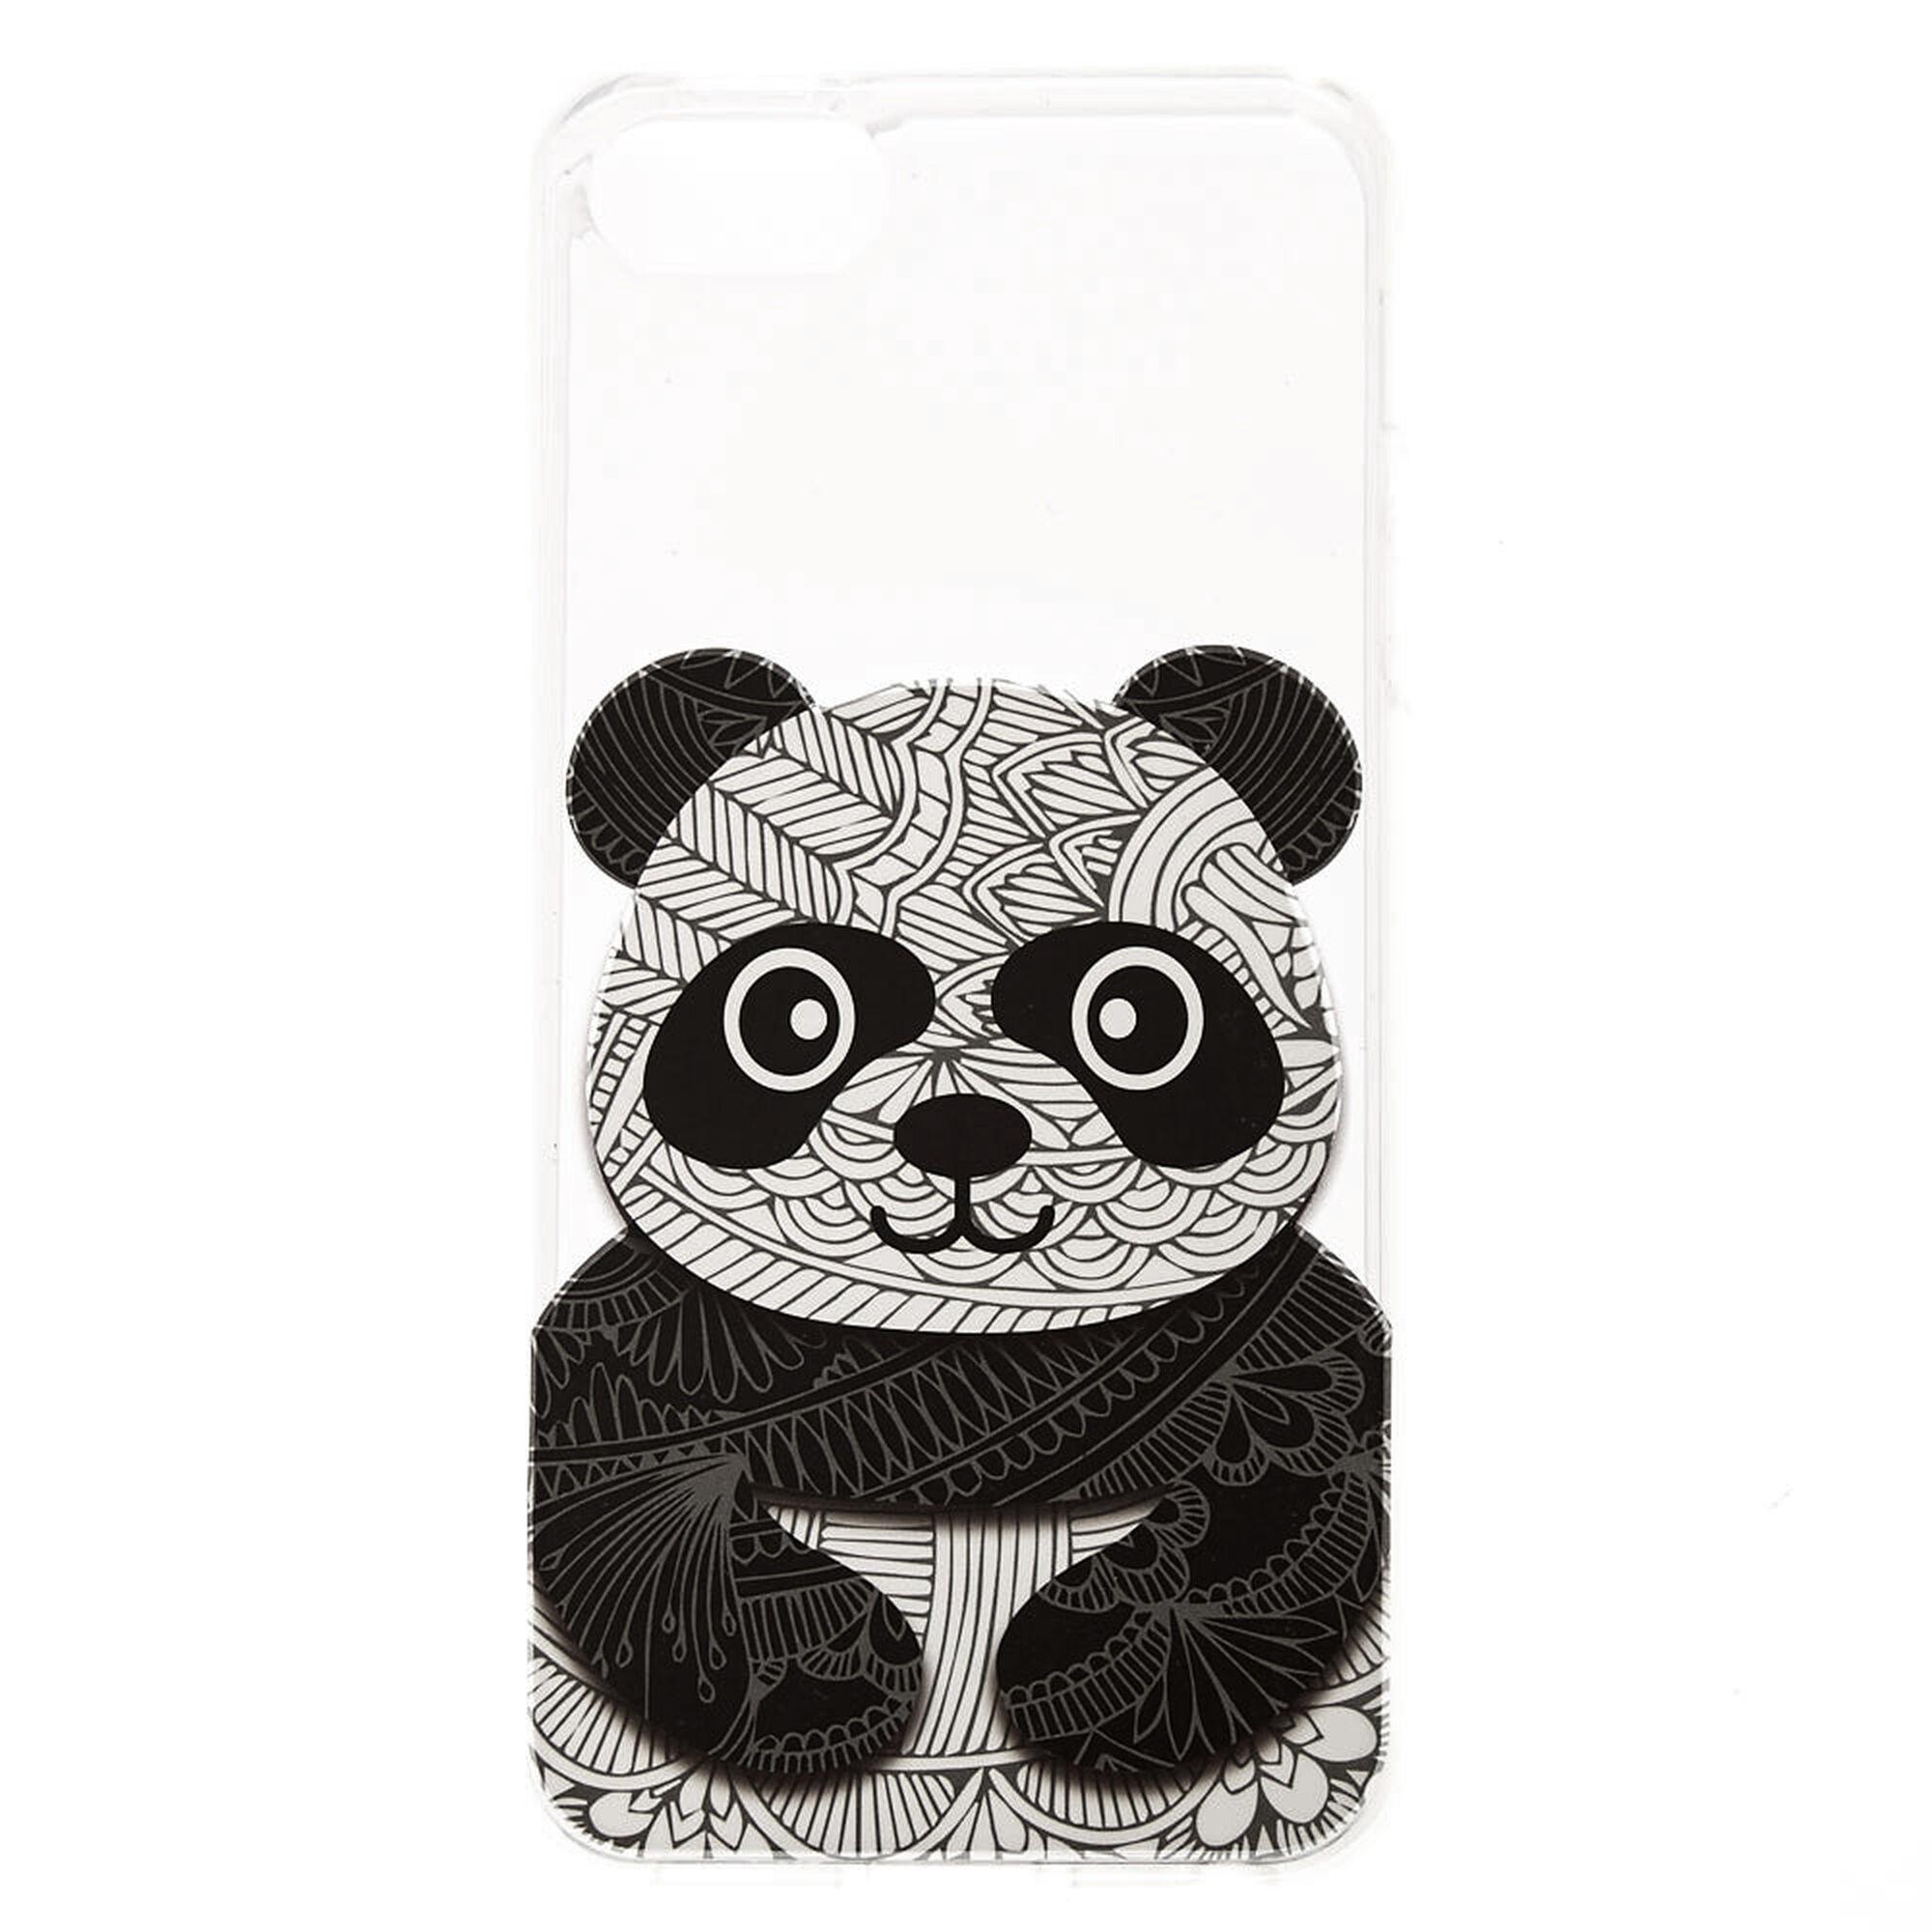 Coque de portable dessin panda claire 39 s fr - Tete de panda dessin ...